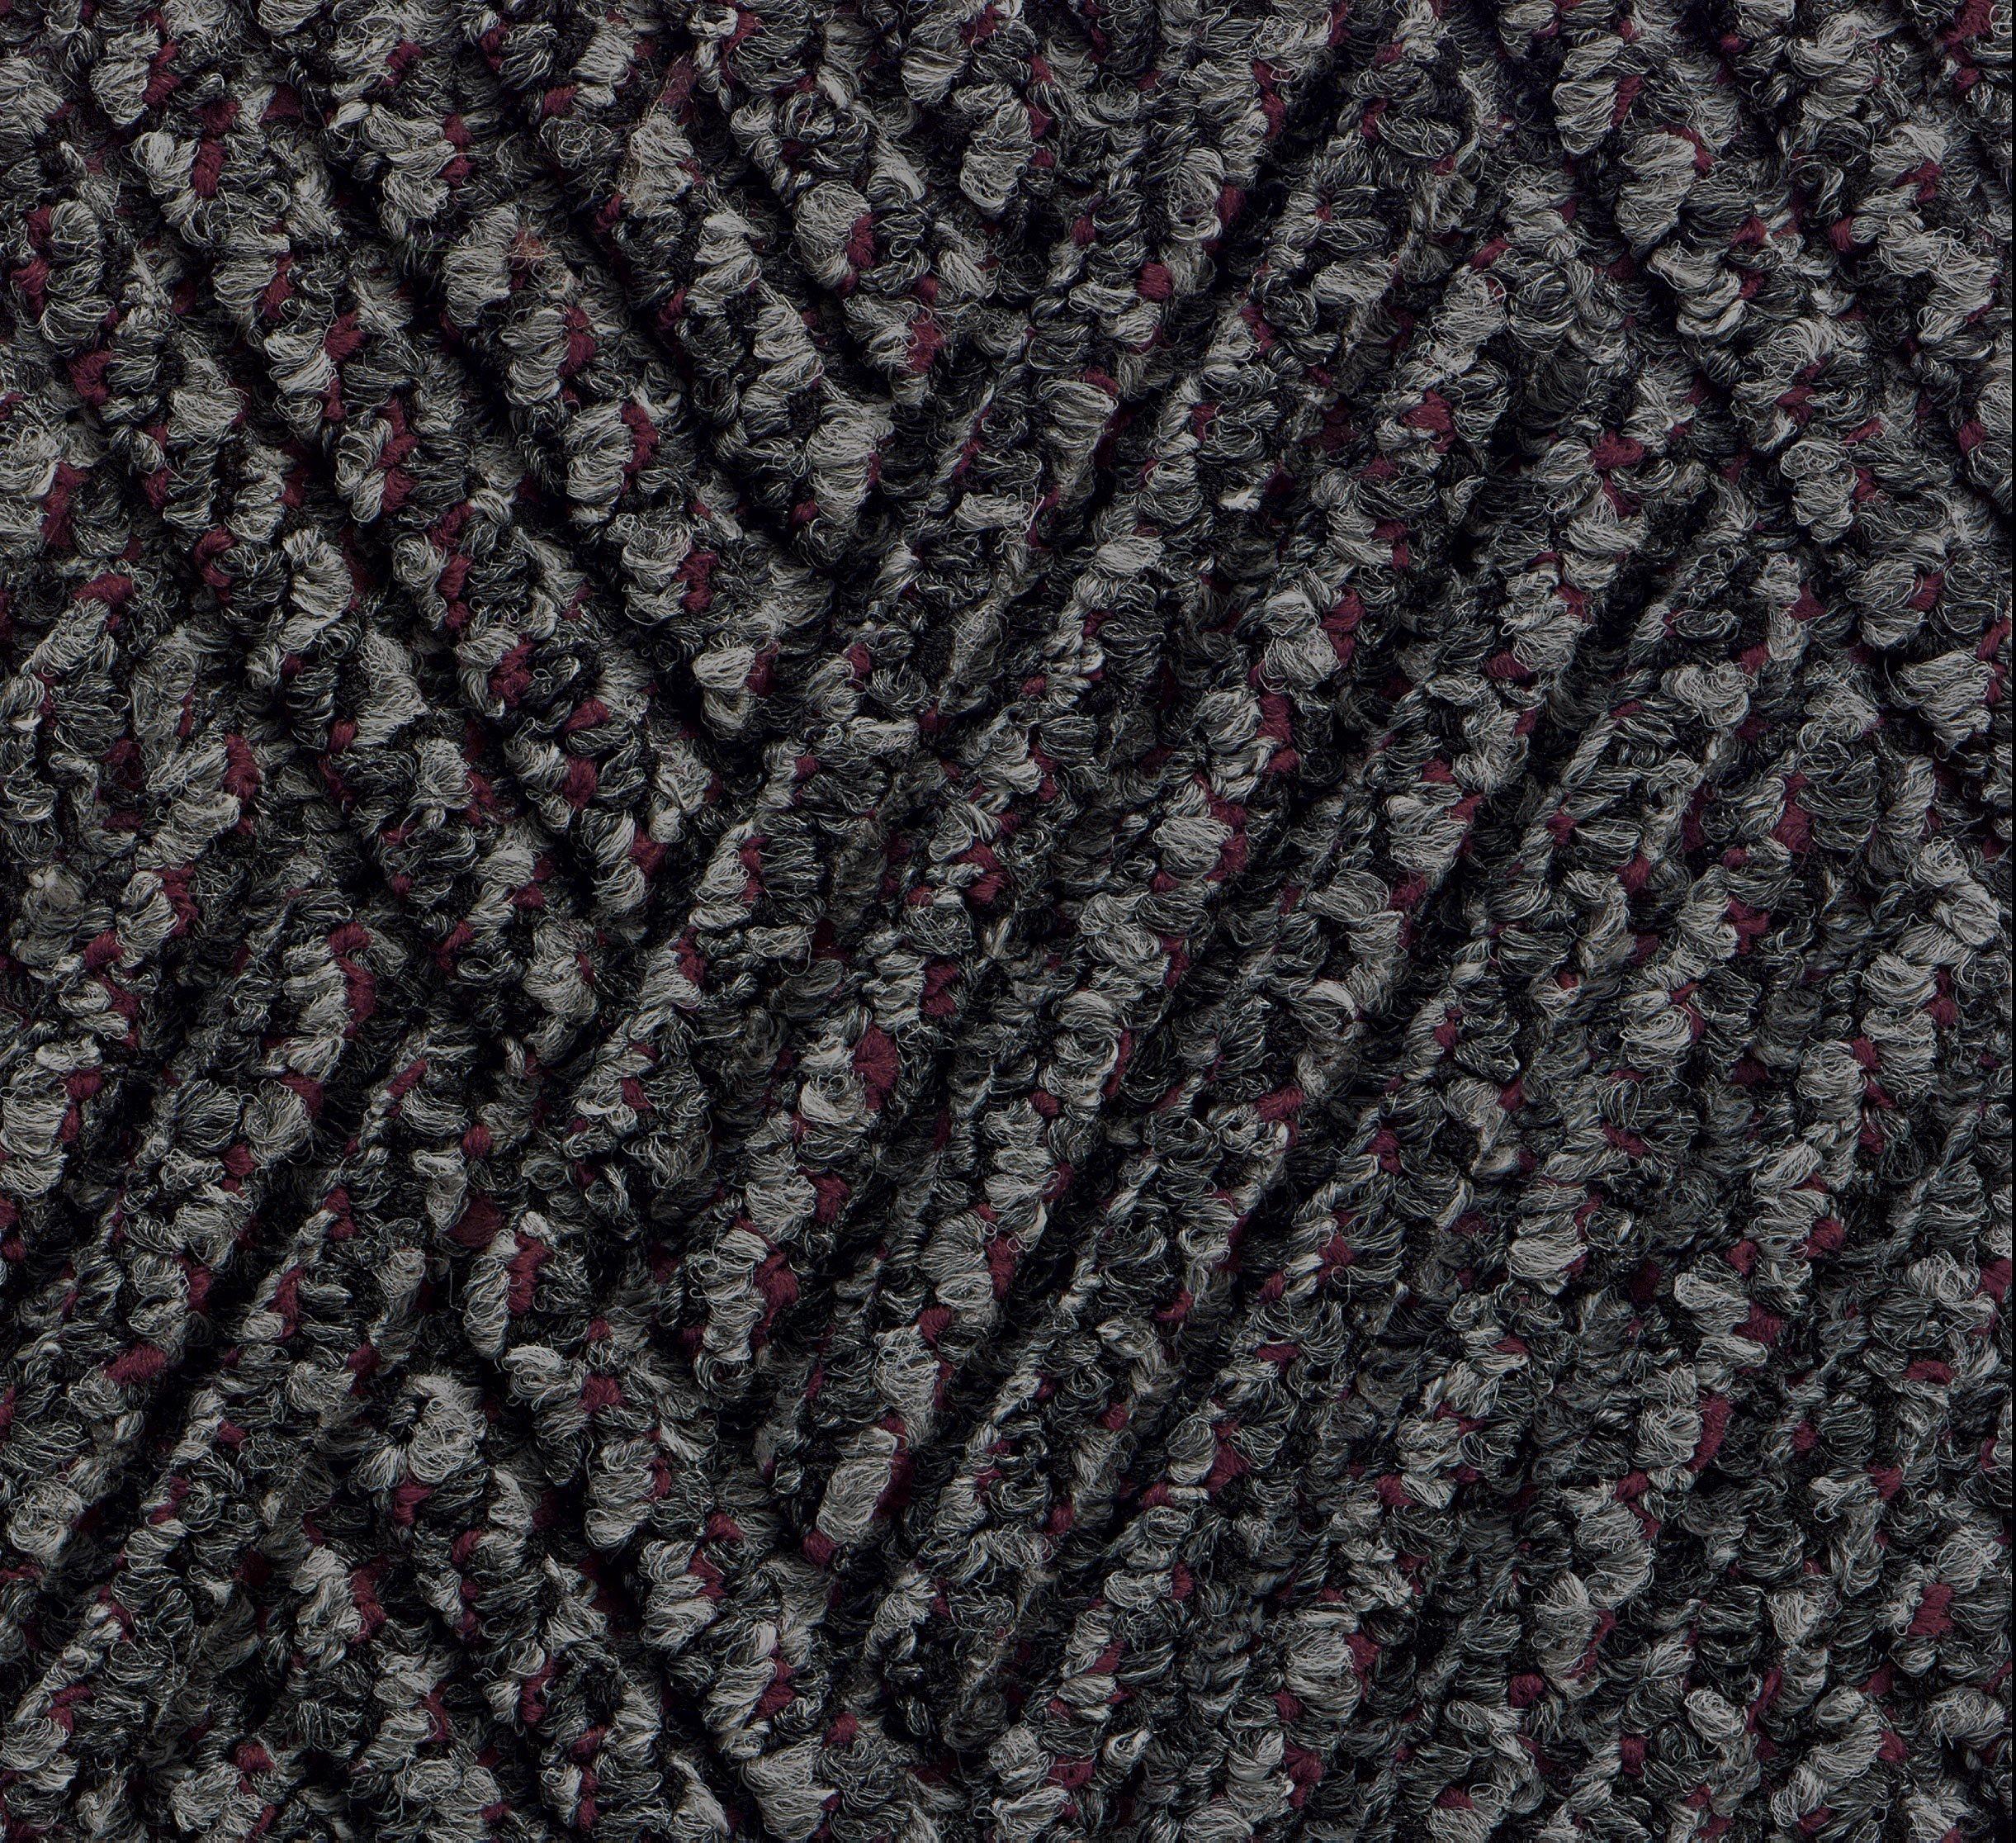 Andersen 296 Waterhog DiamondCord Polypropylene Fiber Interior/Scraper Wiper Floor Mat, SBR Rubber Backing, 10' Length x 3' Width, 3/8'' Thick, Grey Cord